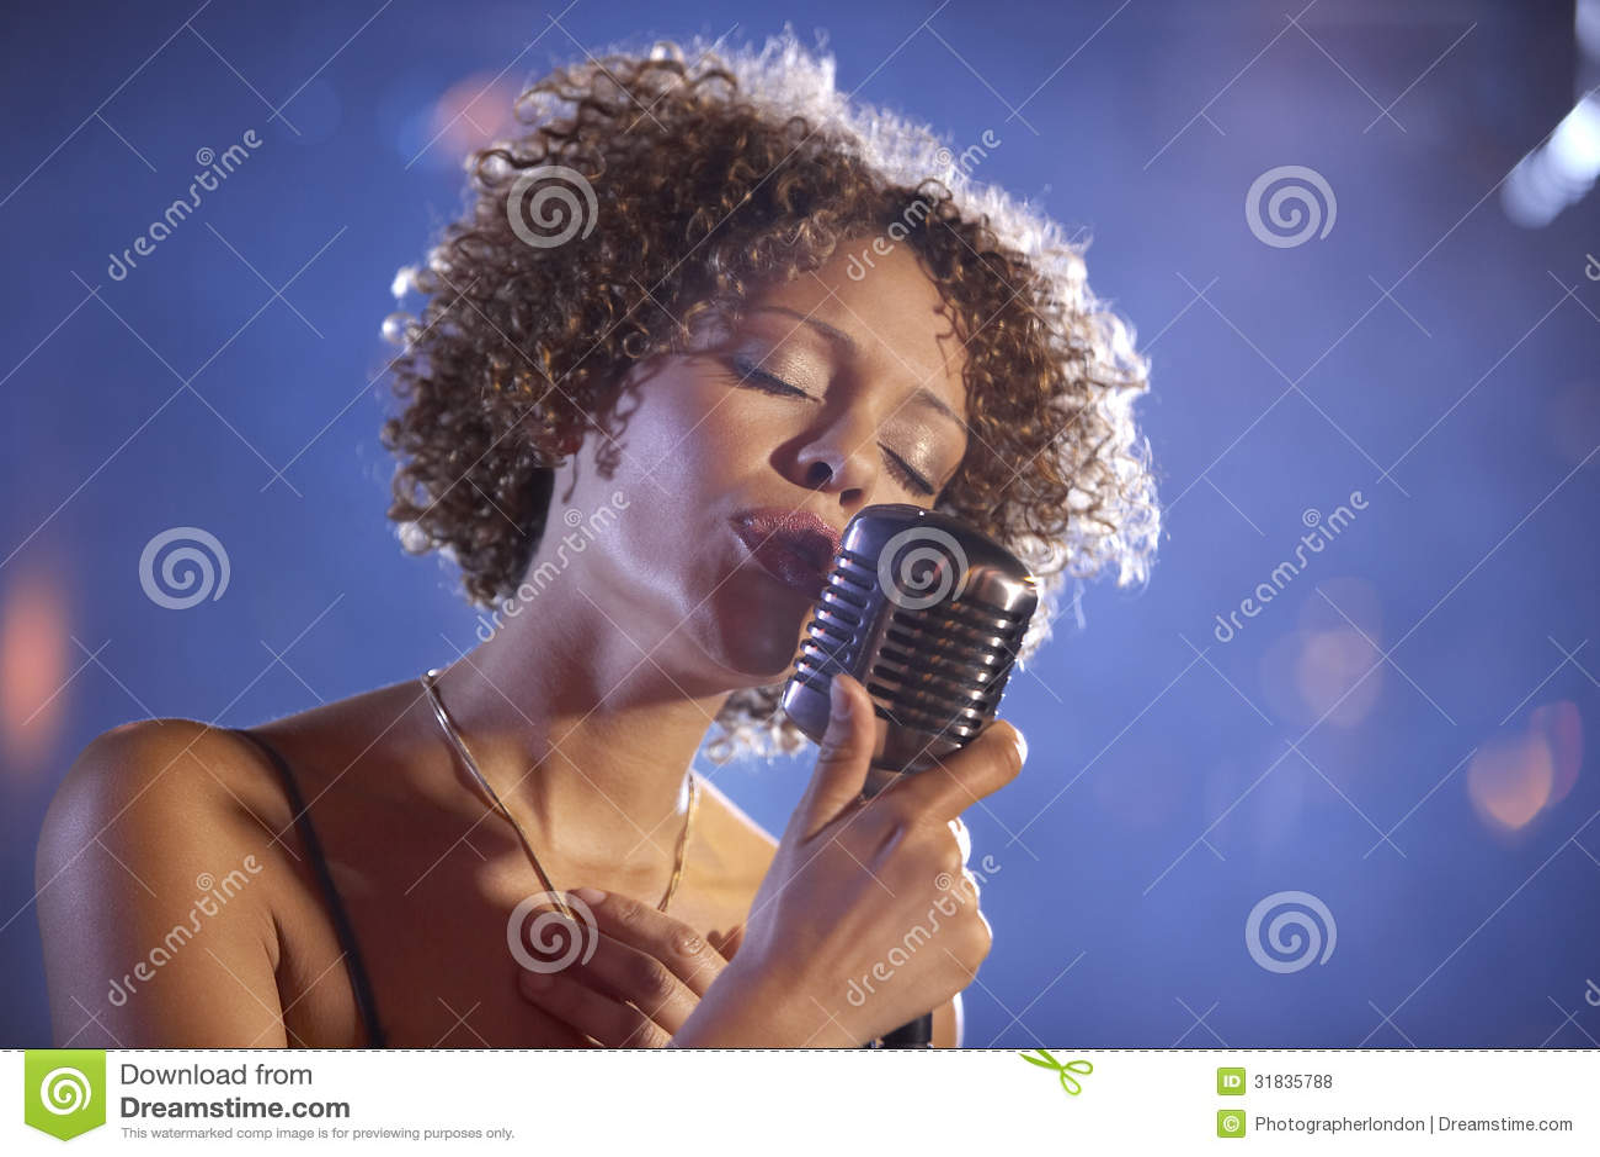 Jazz Singer On Stage femminile